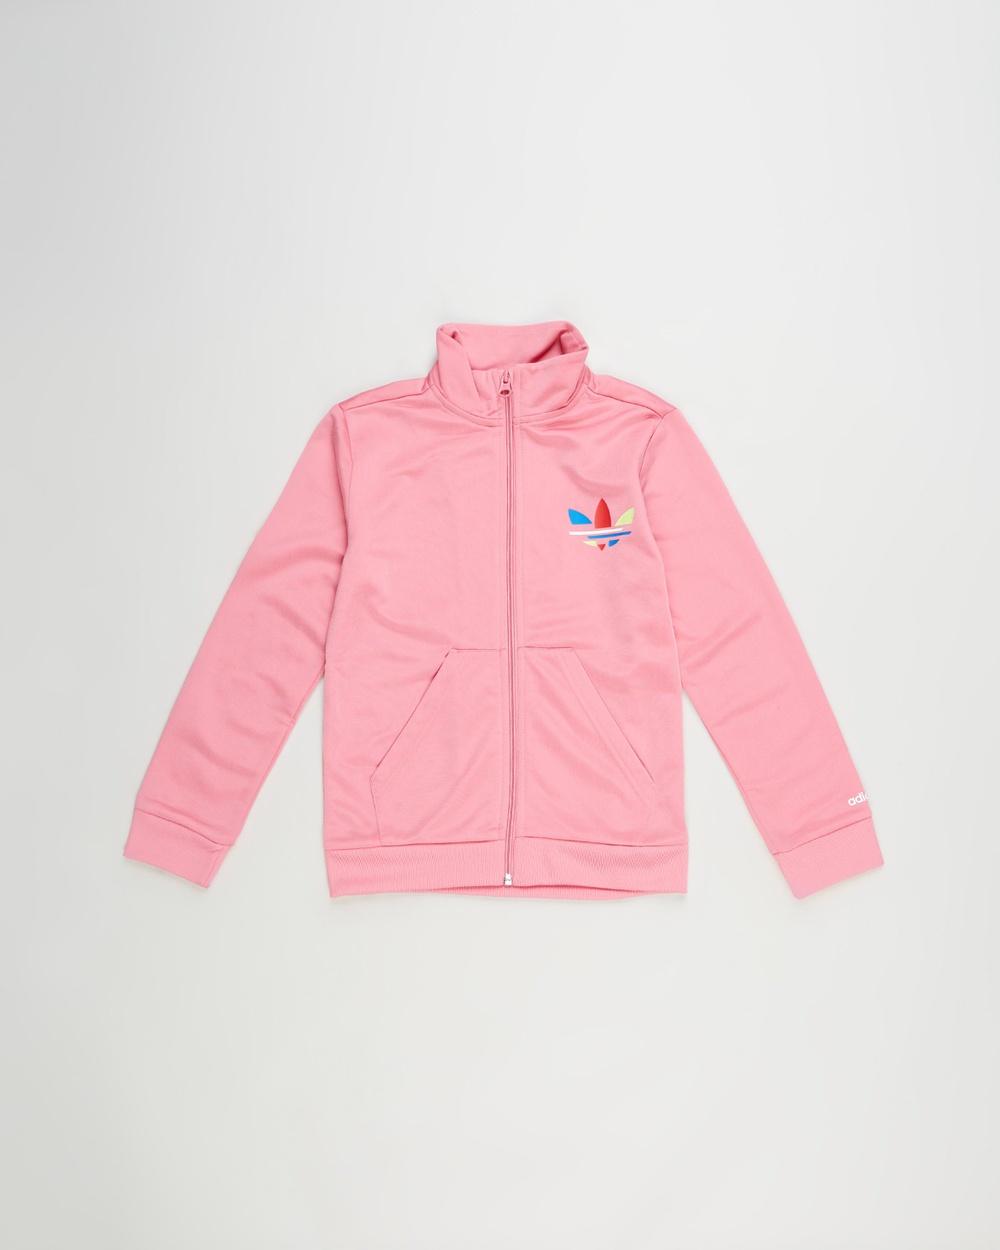 adidas Originals Adicolor Track Top Kids Teens Coats & Jackets Rose Tone Kids-Teens